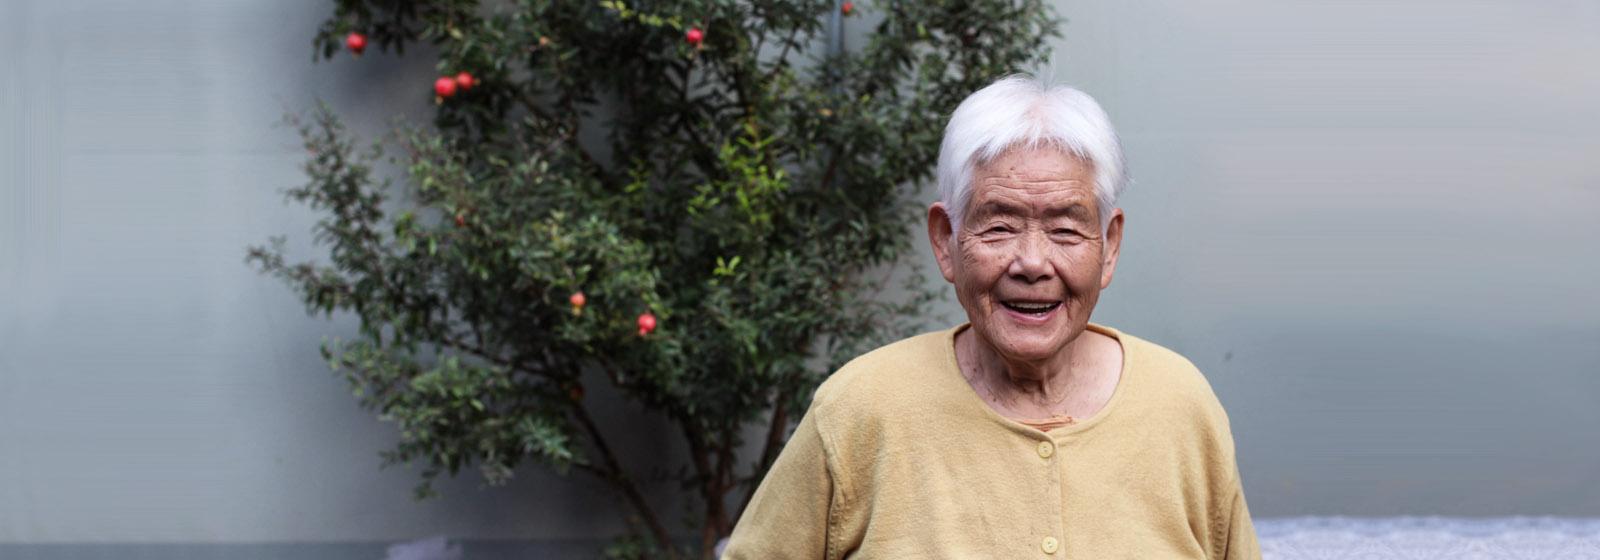 Китайские пенсии